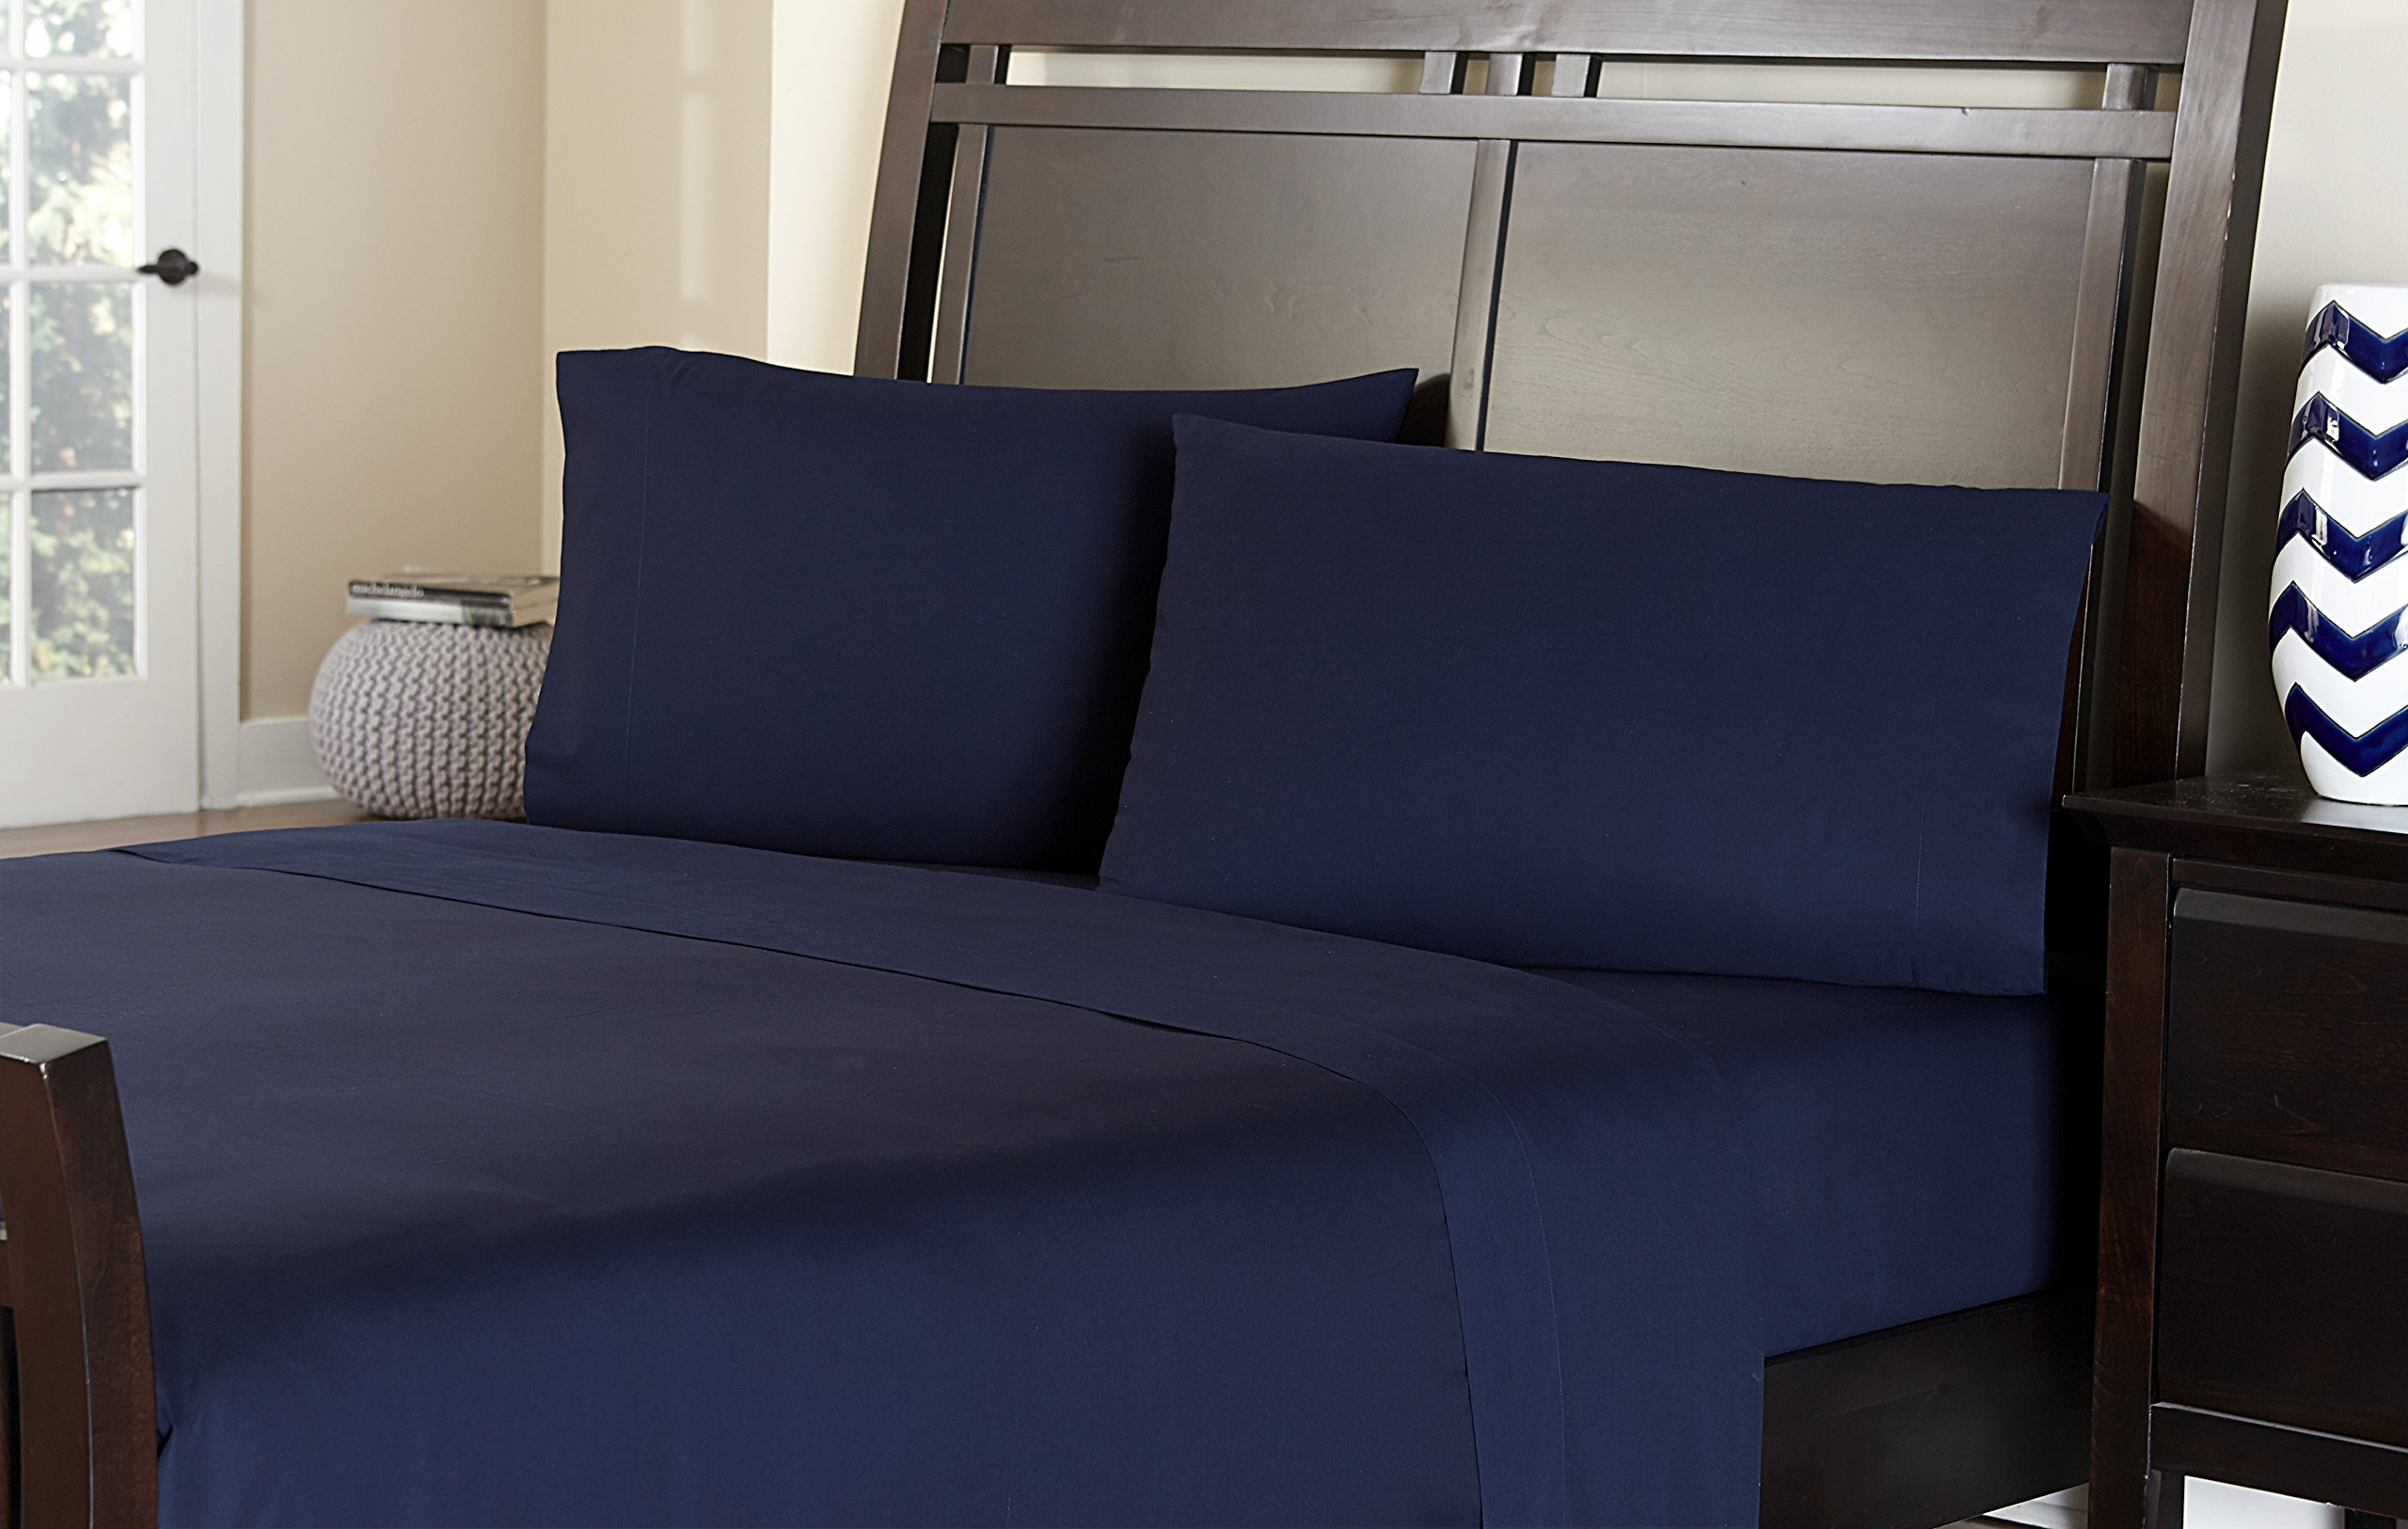 Welspun Amaze 310 Thread Count Ultimate Performance Cotton Sheet Set, Full, Navy Blue